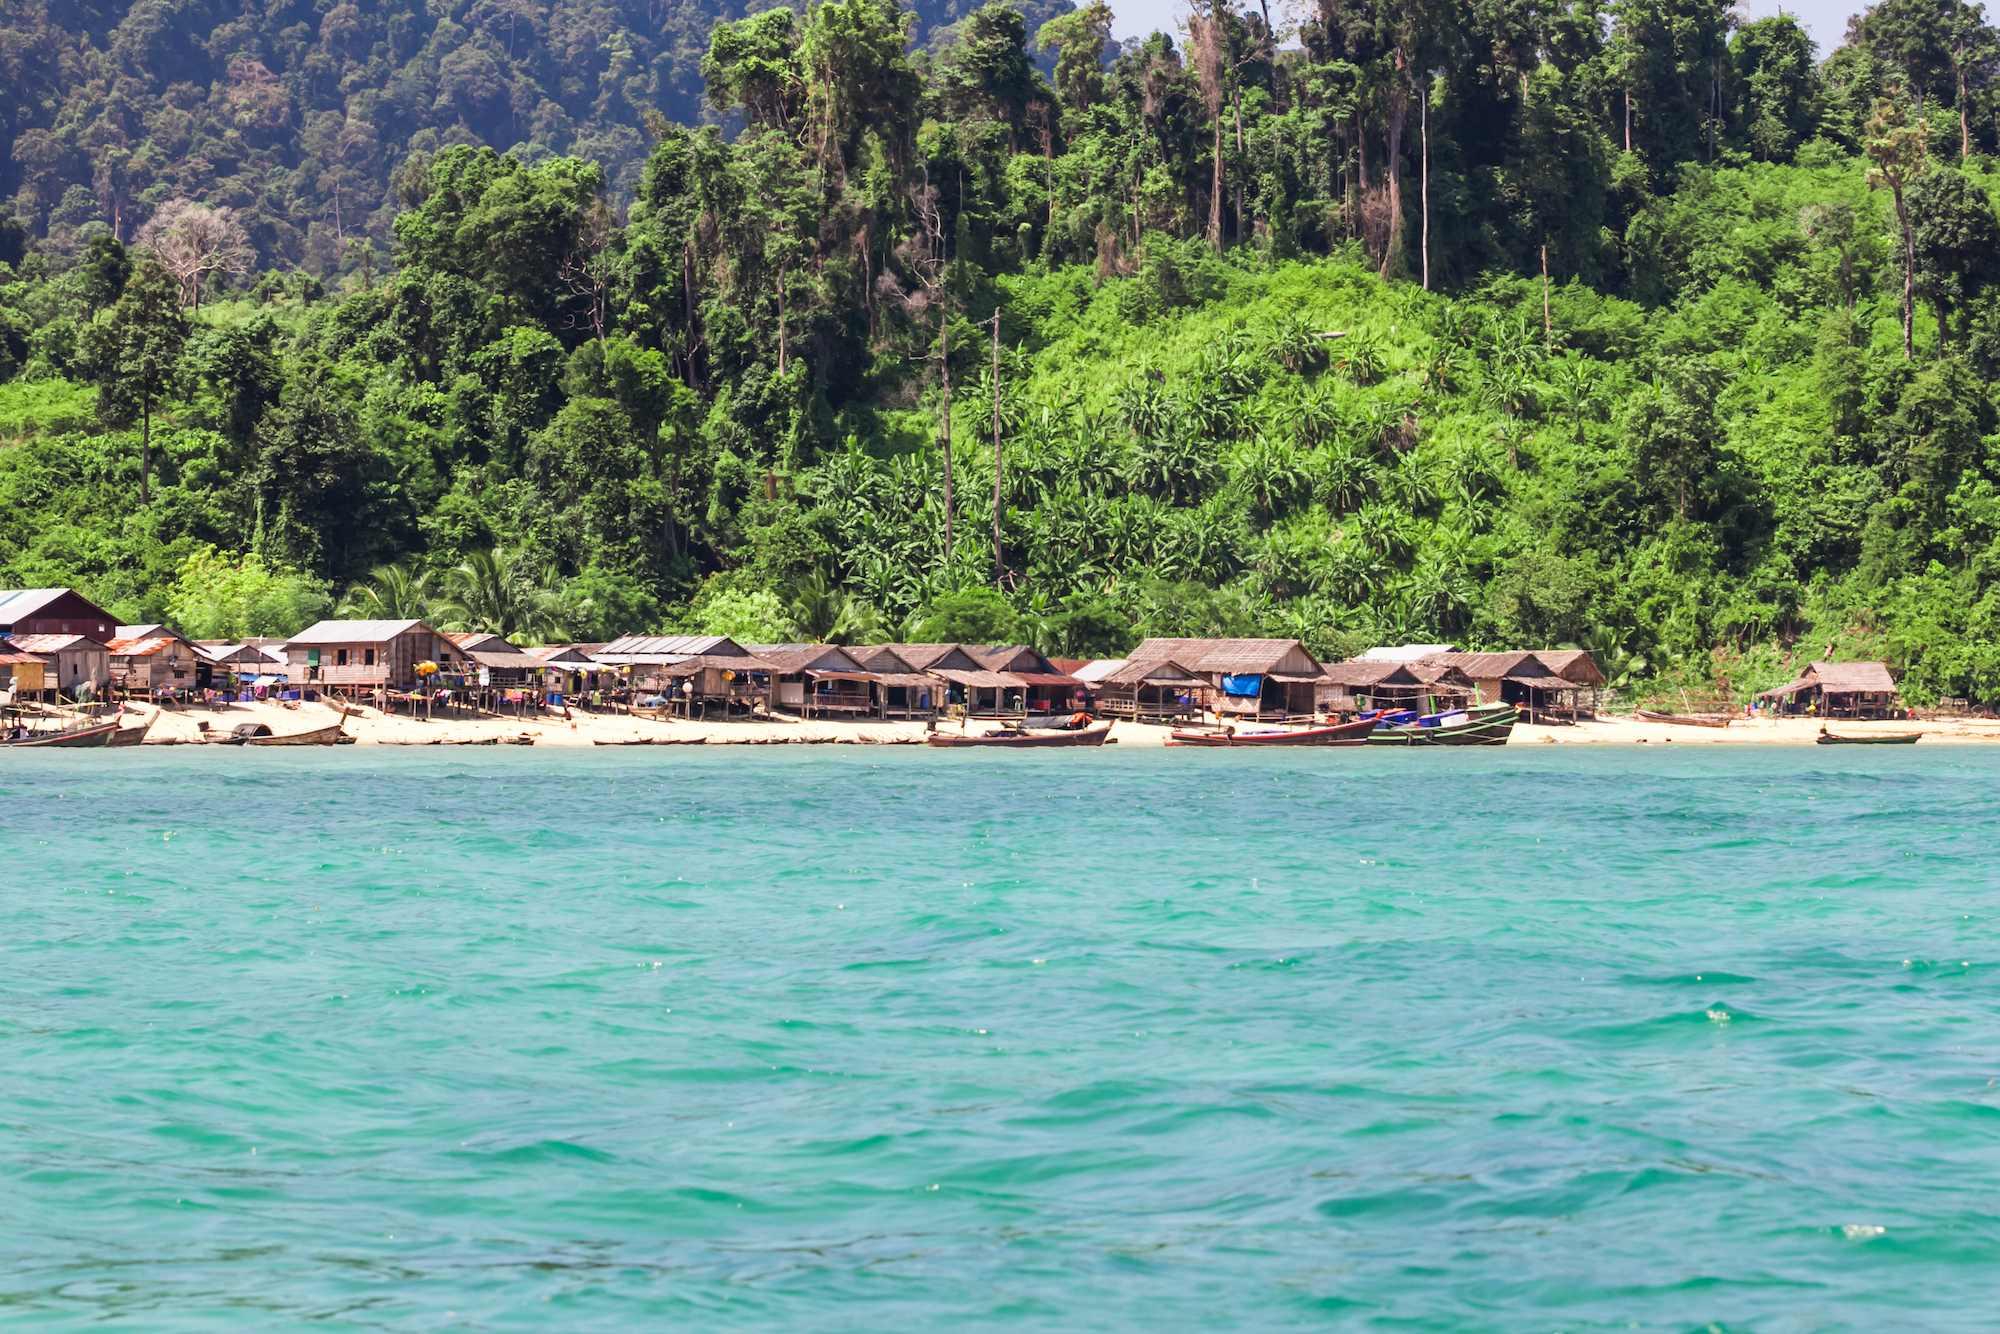 Burma Boating moken beach and village.jpg